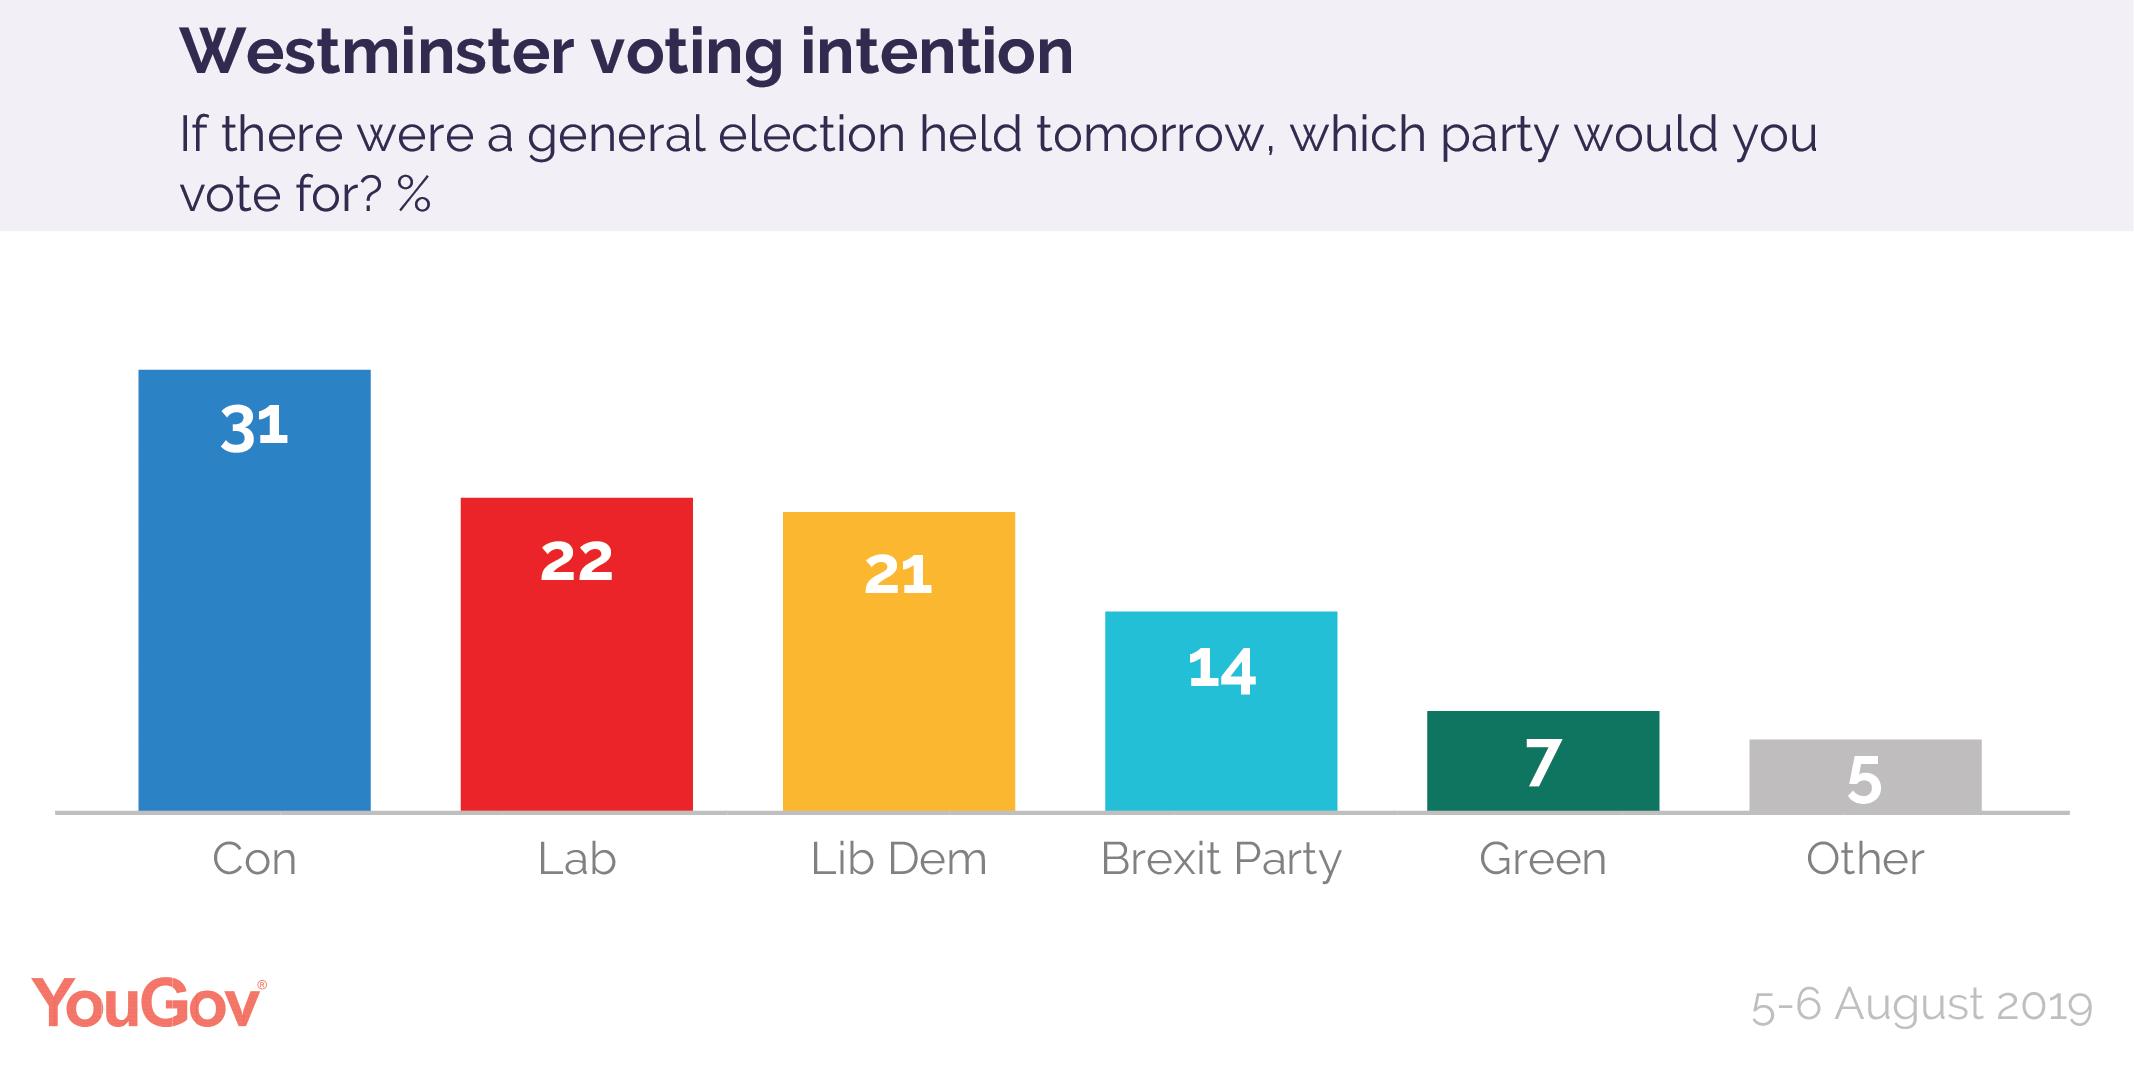 Voting Intention: Con 31%, Lab 22%, Lib Dem 21%, Brex 14% (5-6 Aug) | YouGov